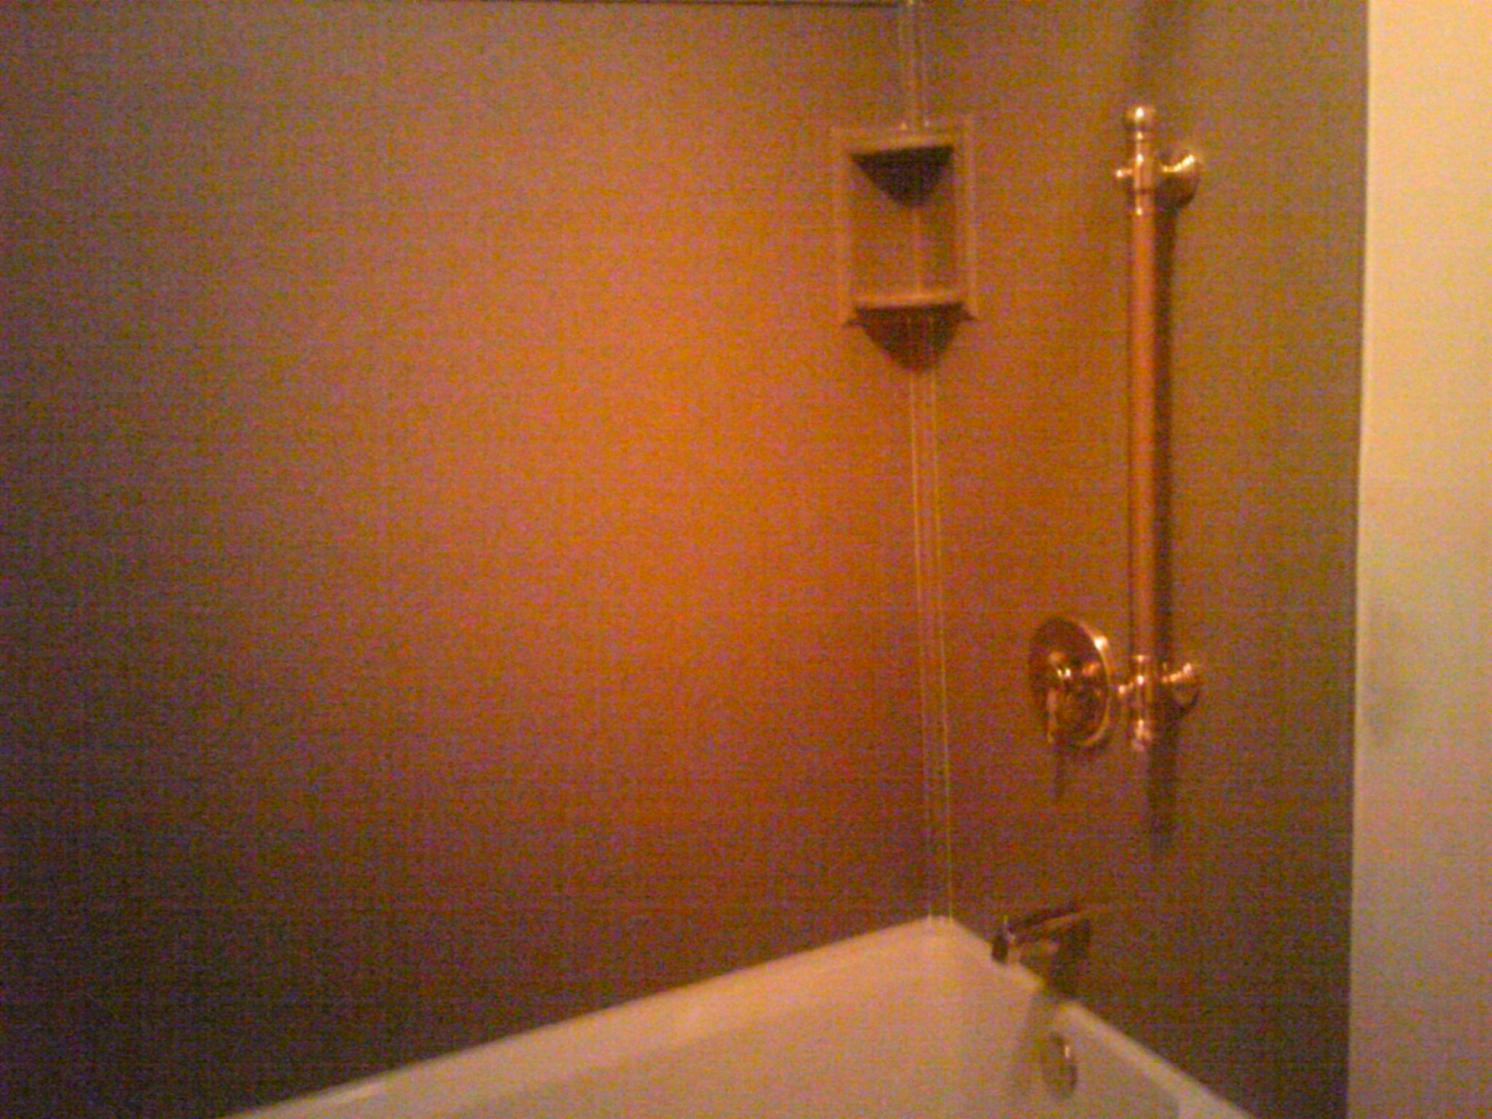 tiling walls on a tub-day-job-pics-001.jpg